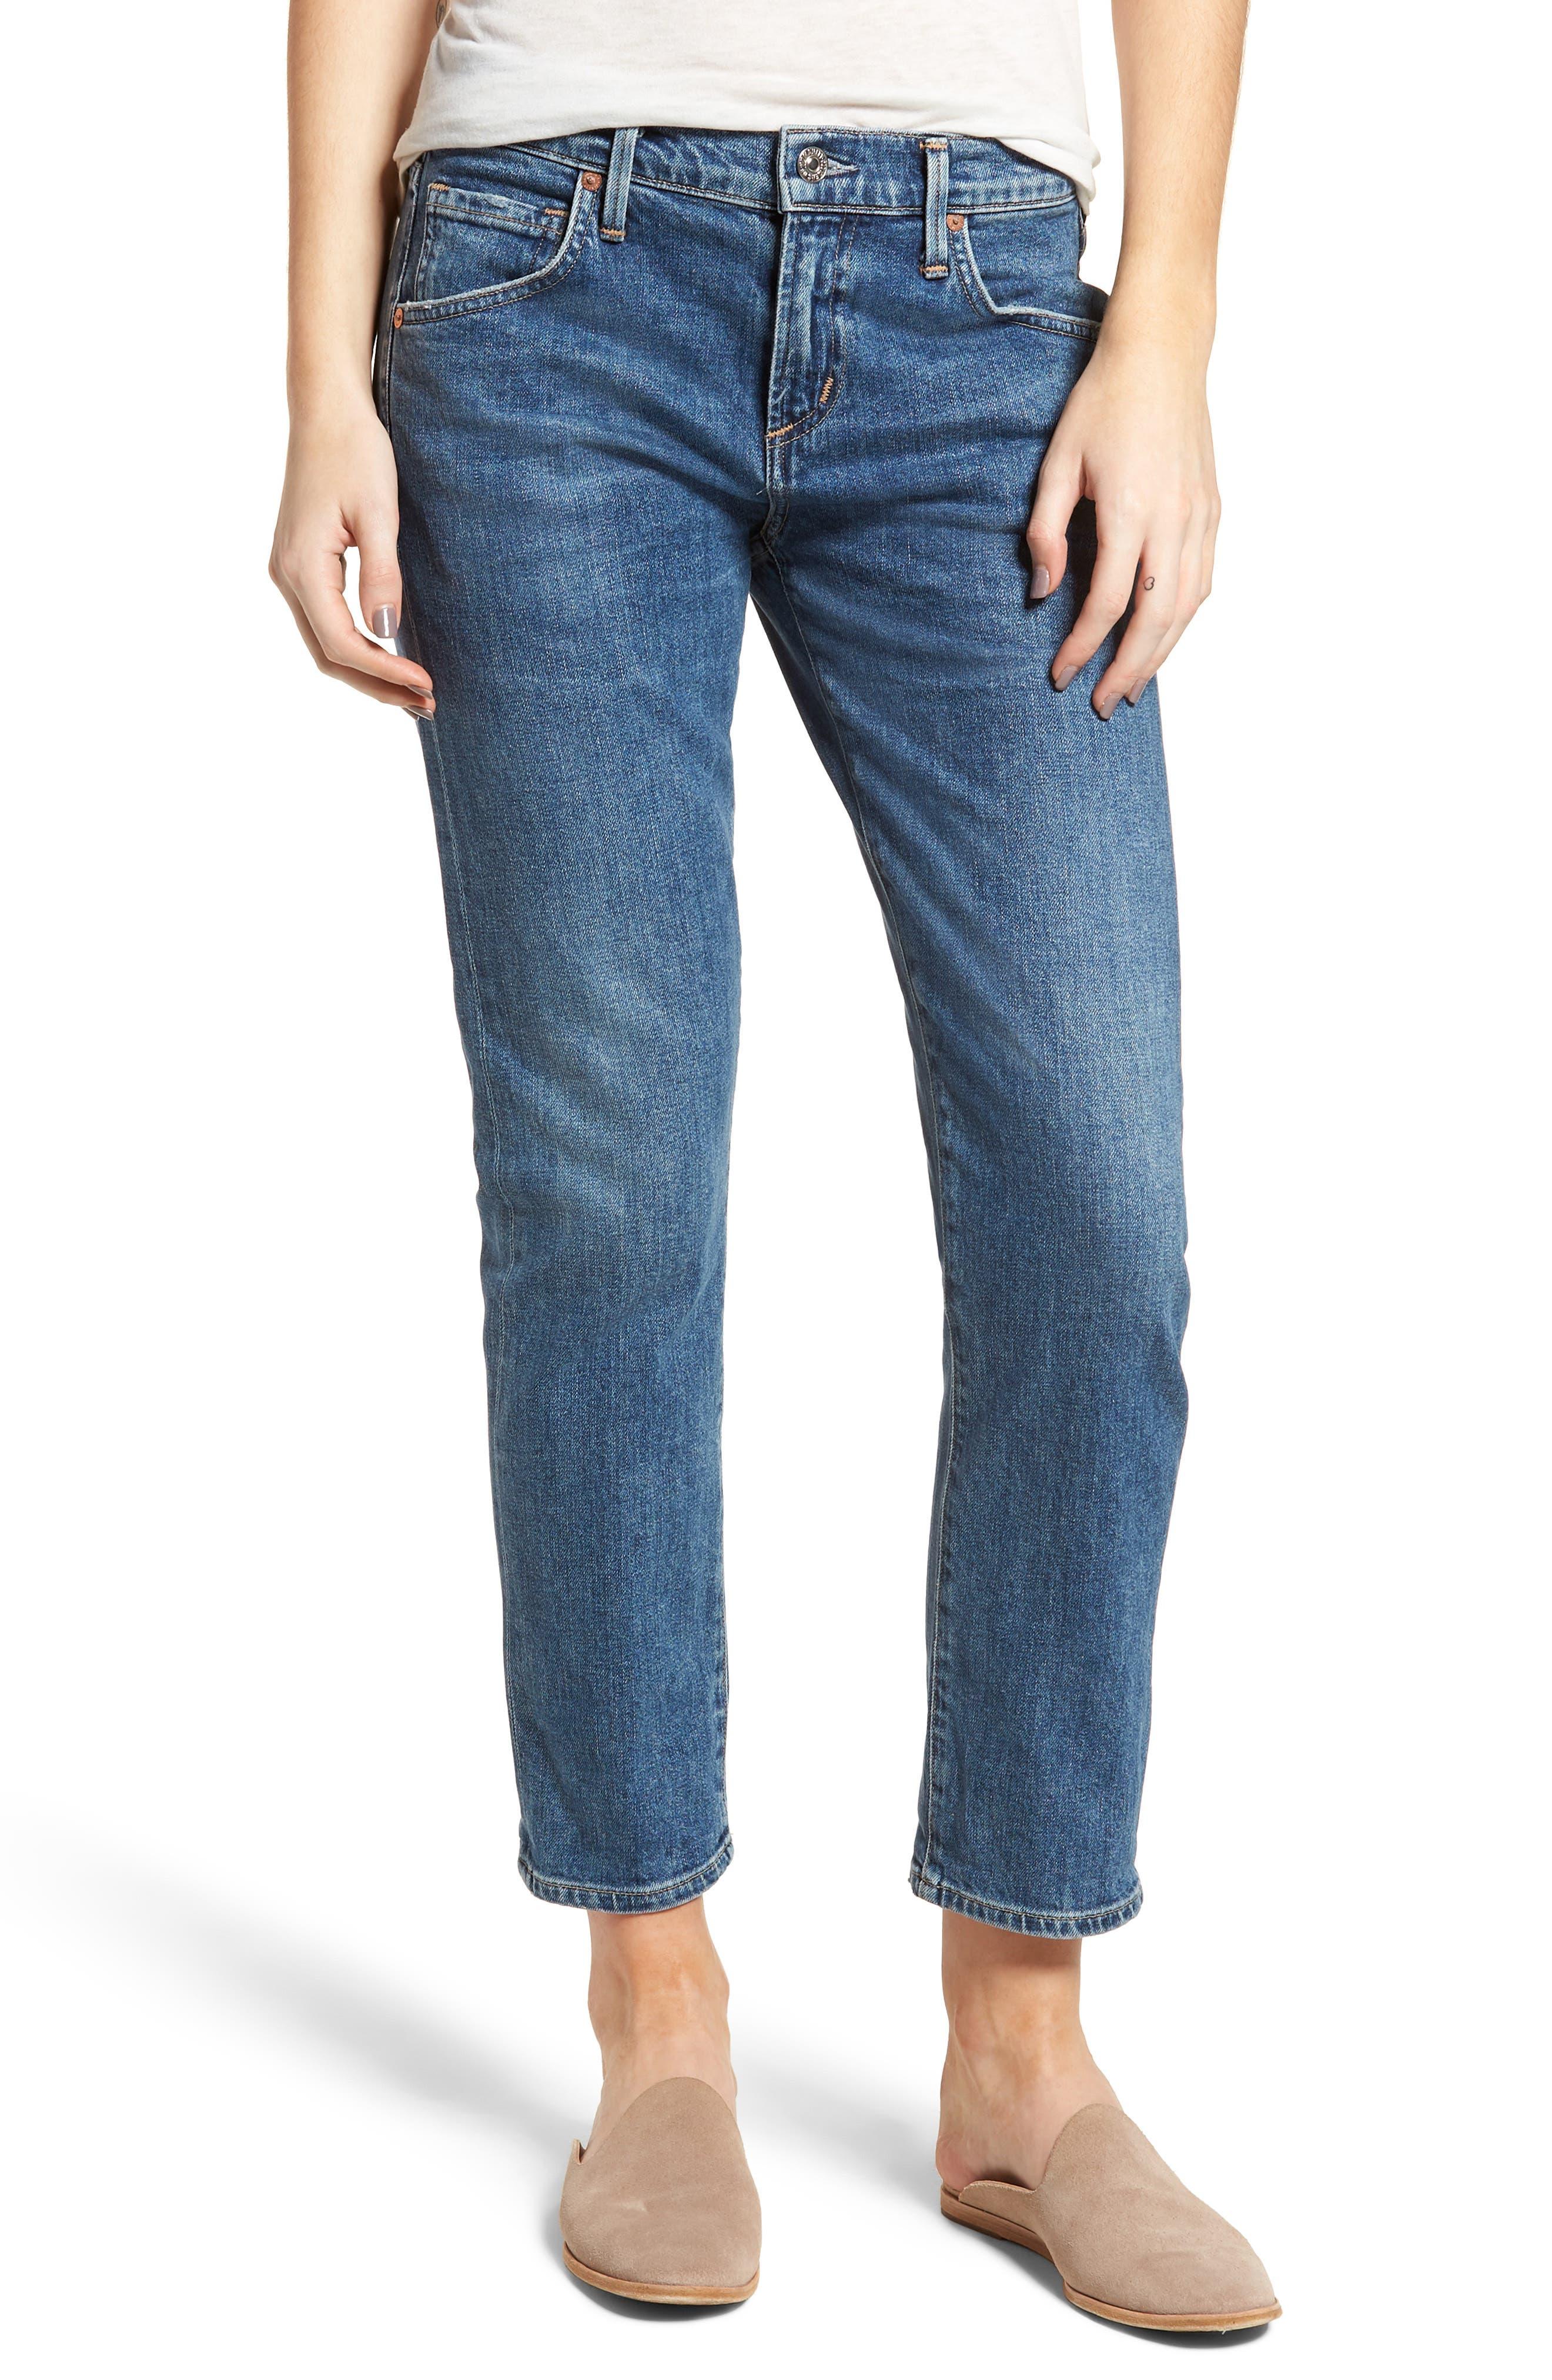 Citizens of Humanity Emerson Slim Boyfriend Jeans (Century)